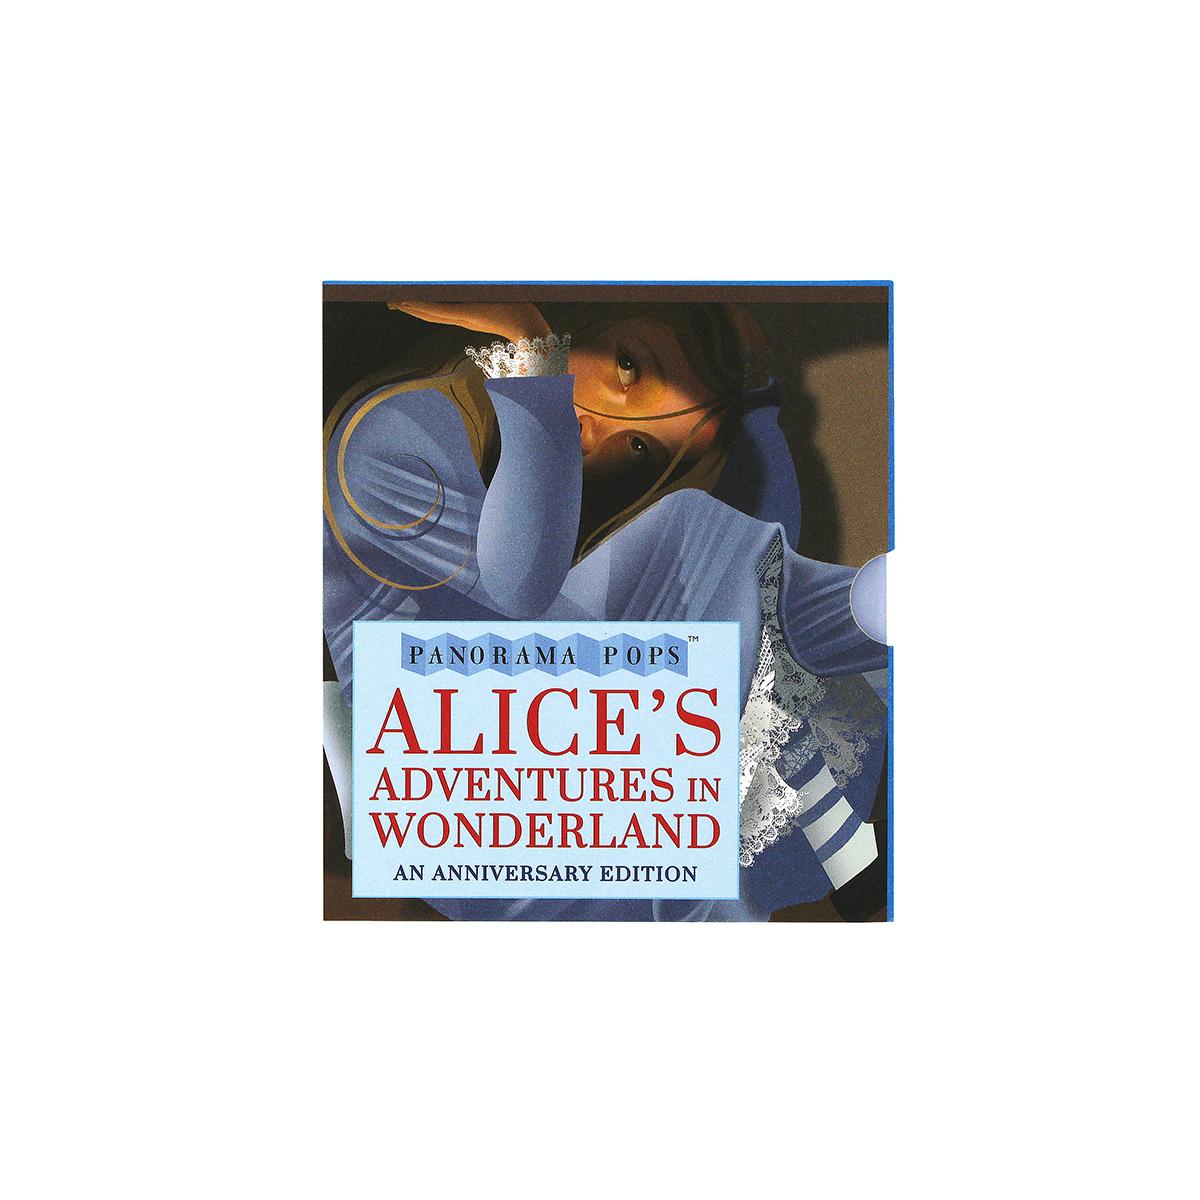 Alice in Wonderland: Panorama Pops